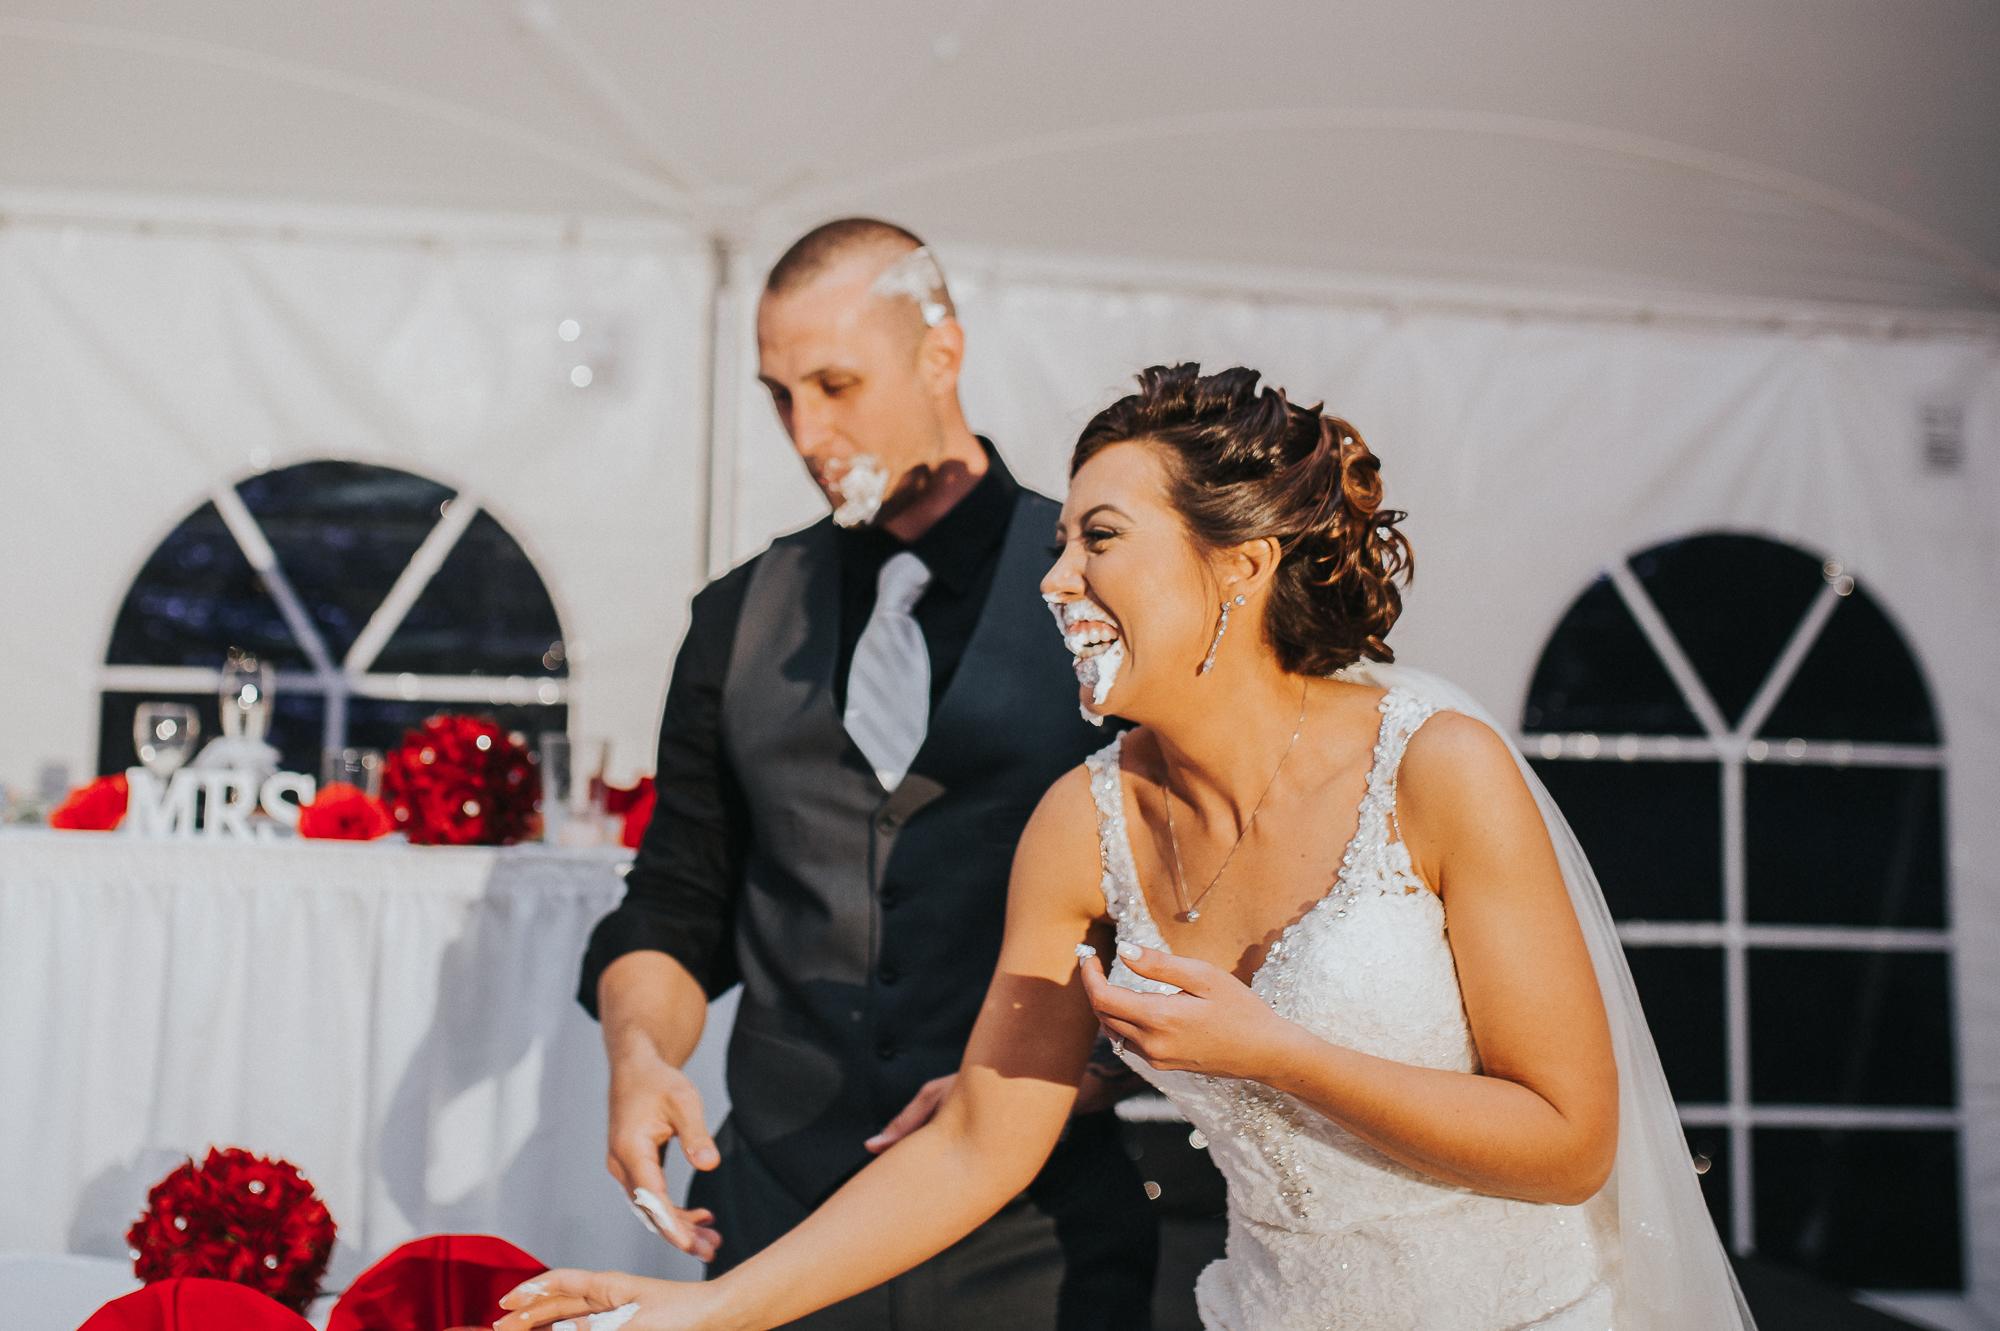 Christina-and-Gene-Wedding-Marla-Rain-Photography-600.jpg